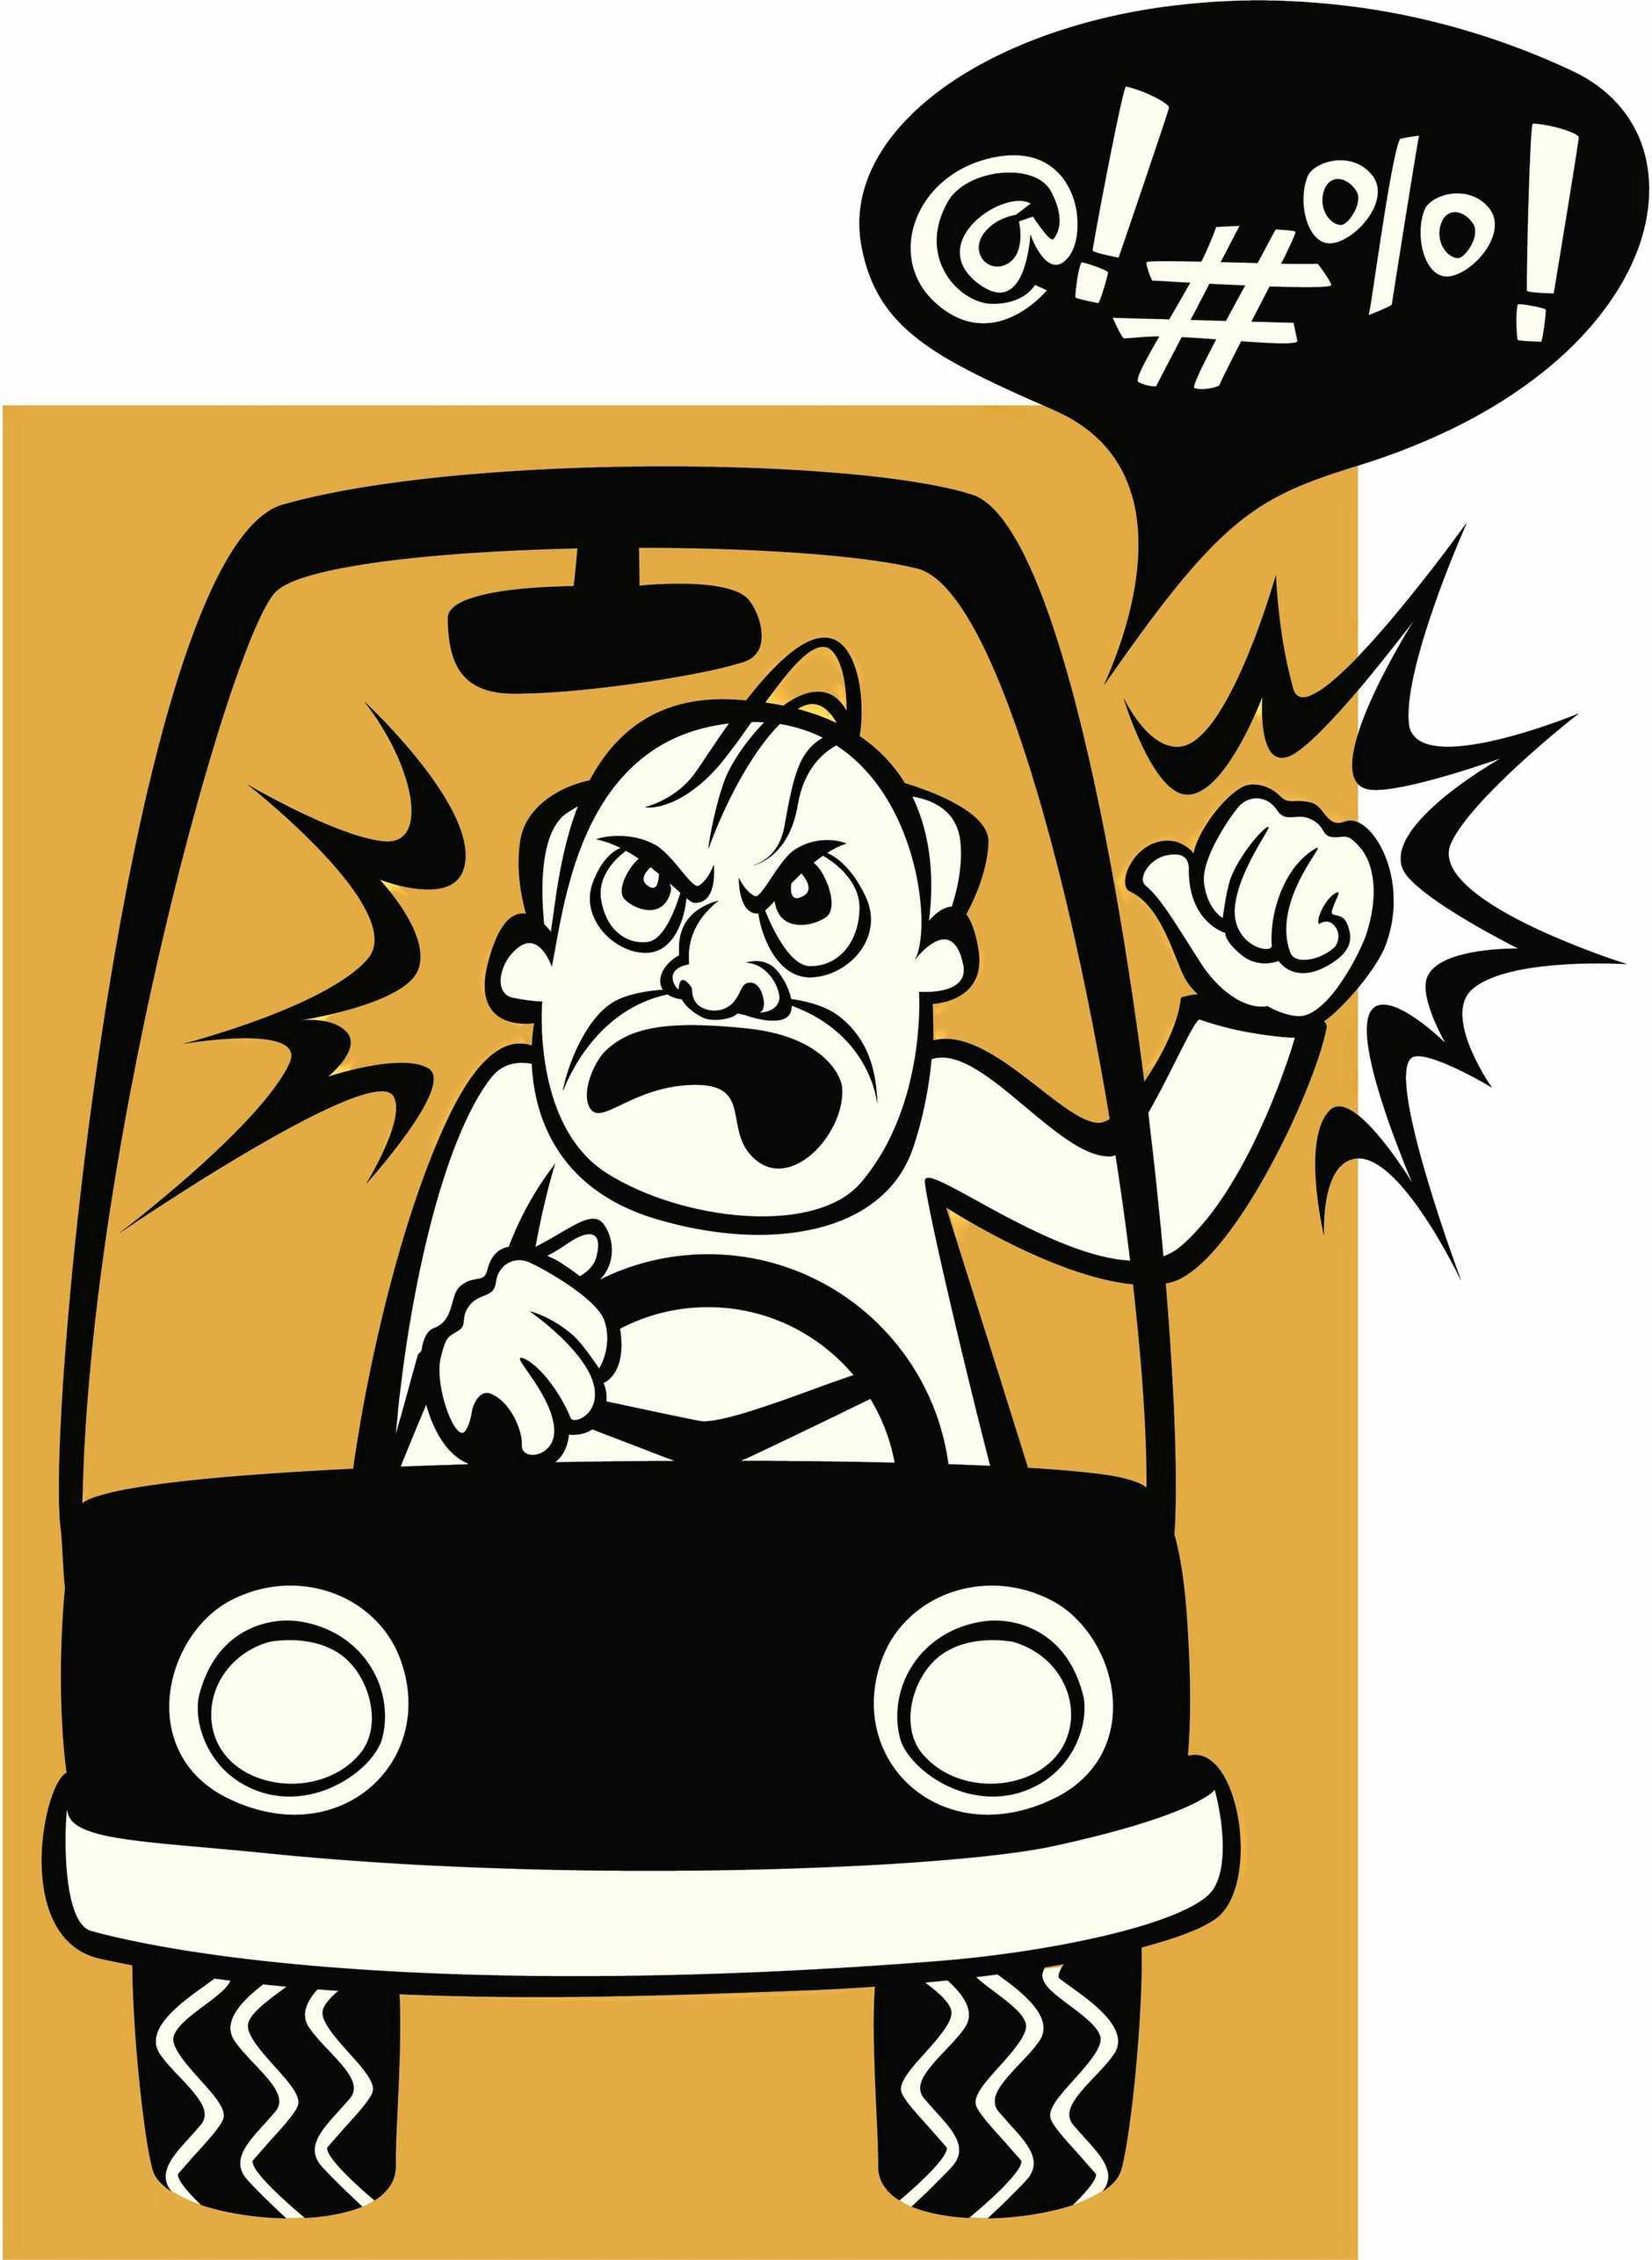 ROAD RAGE: A sense of entitlement on four wheels.